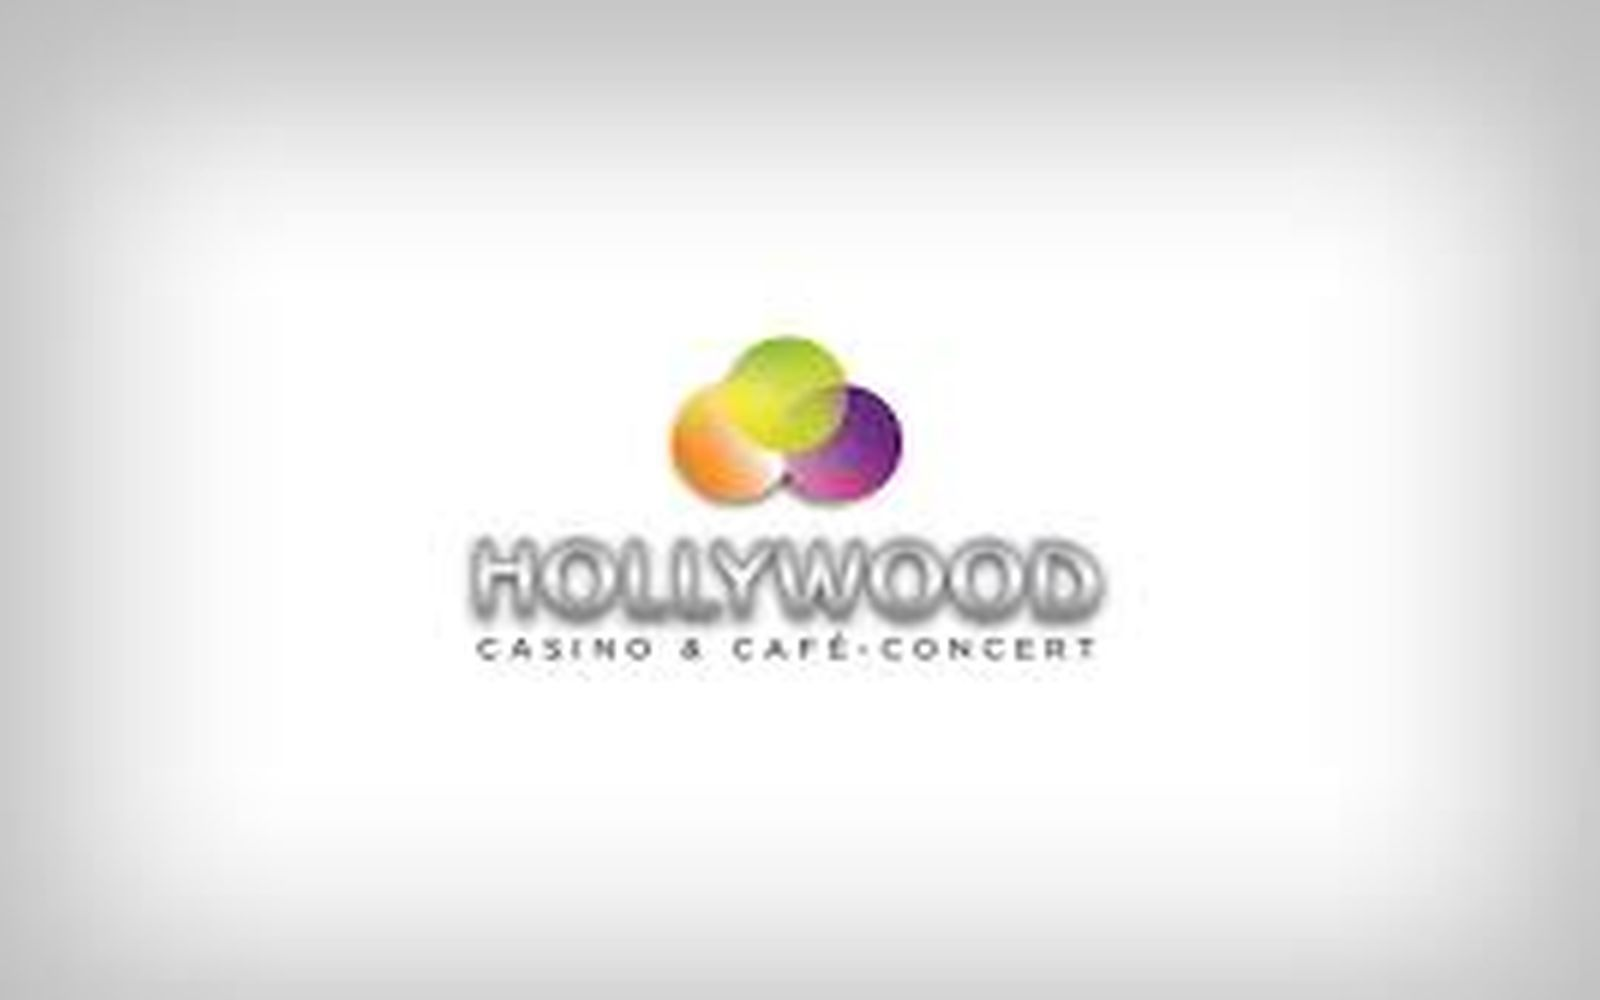 Hollywood Milla